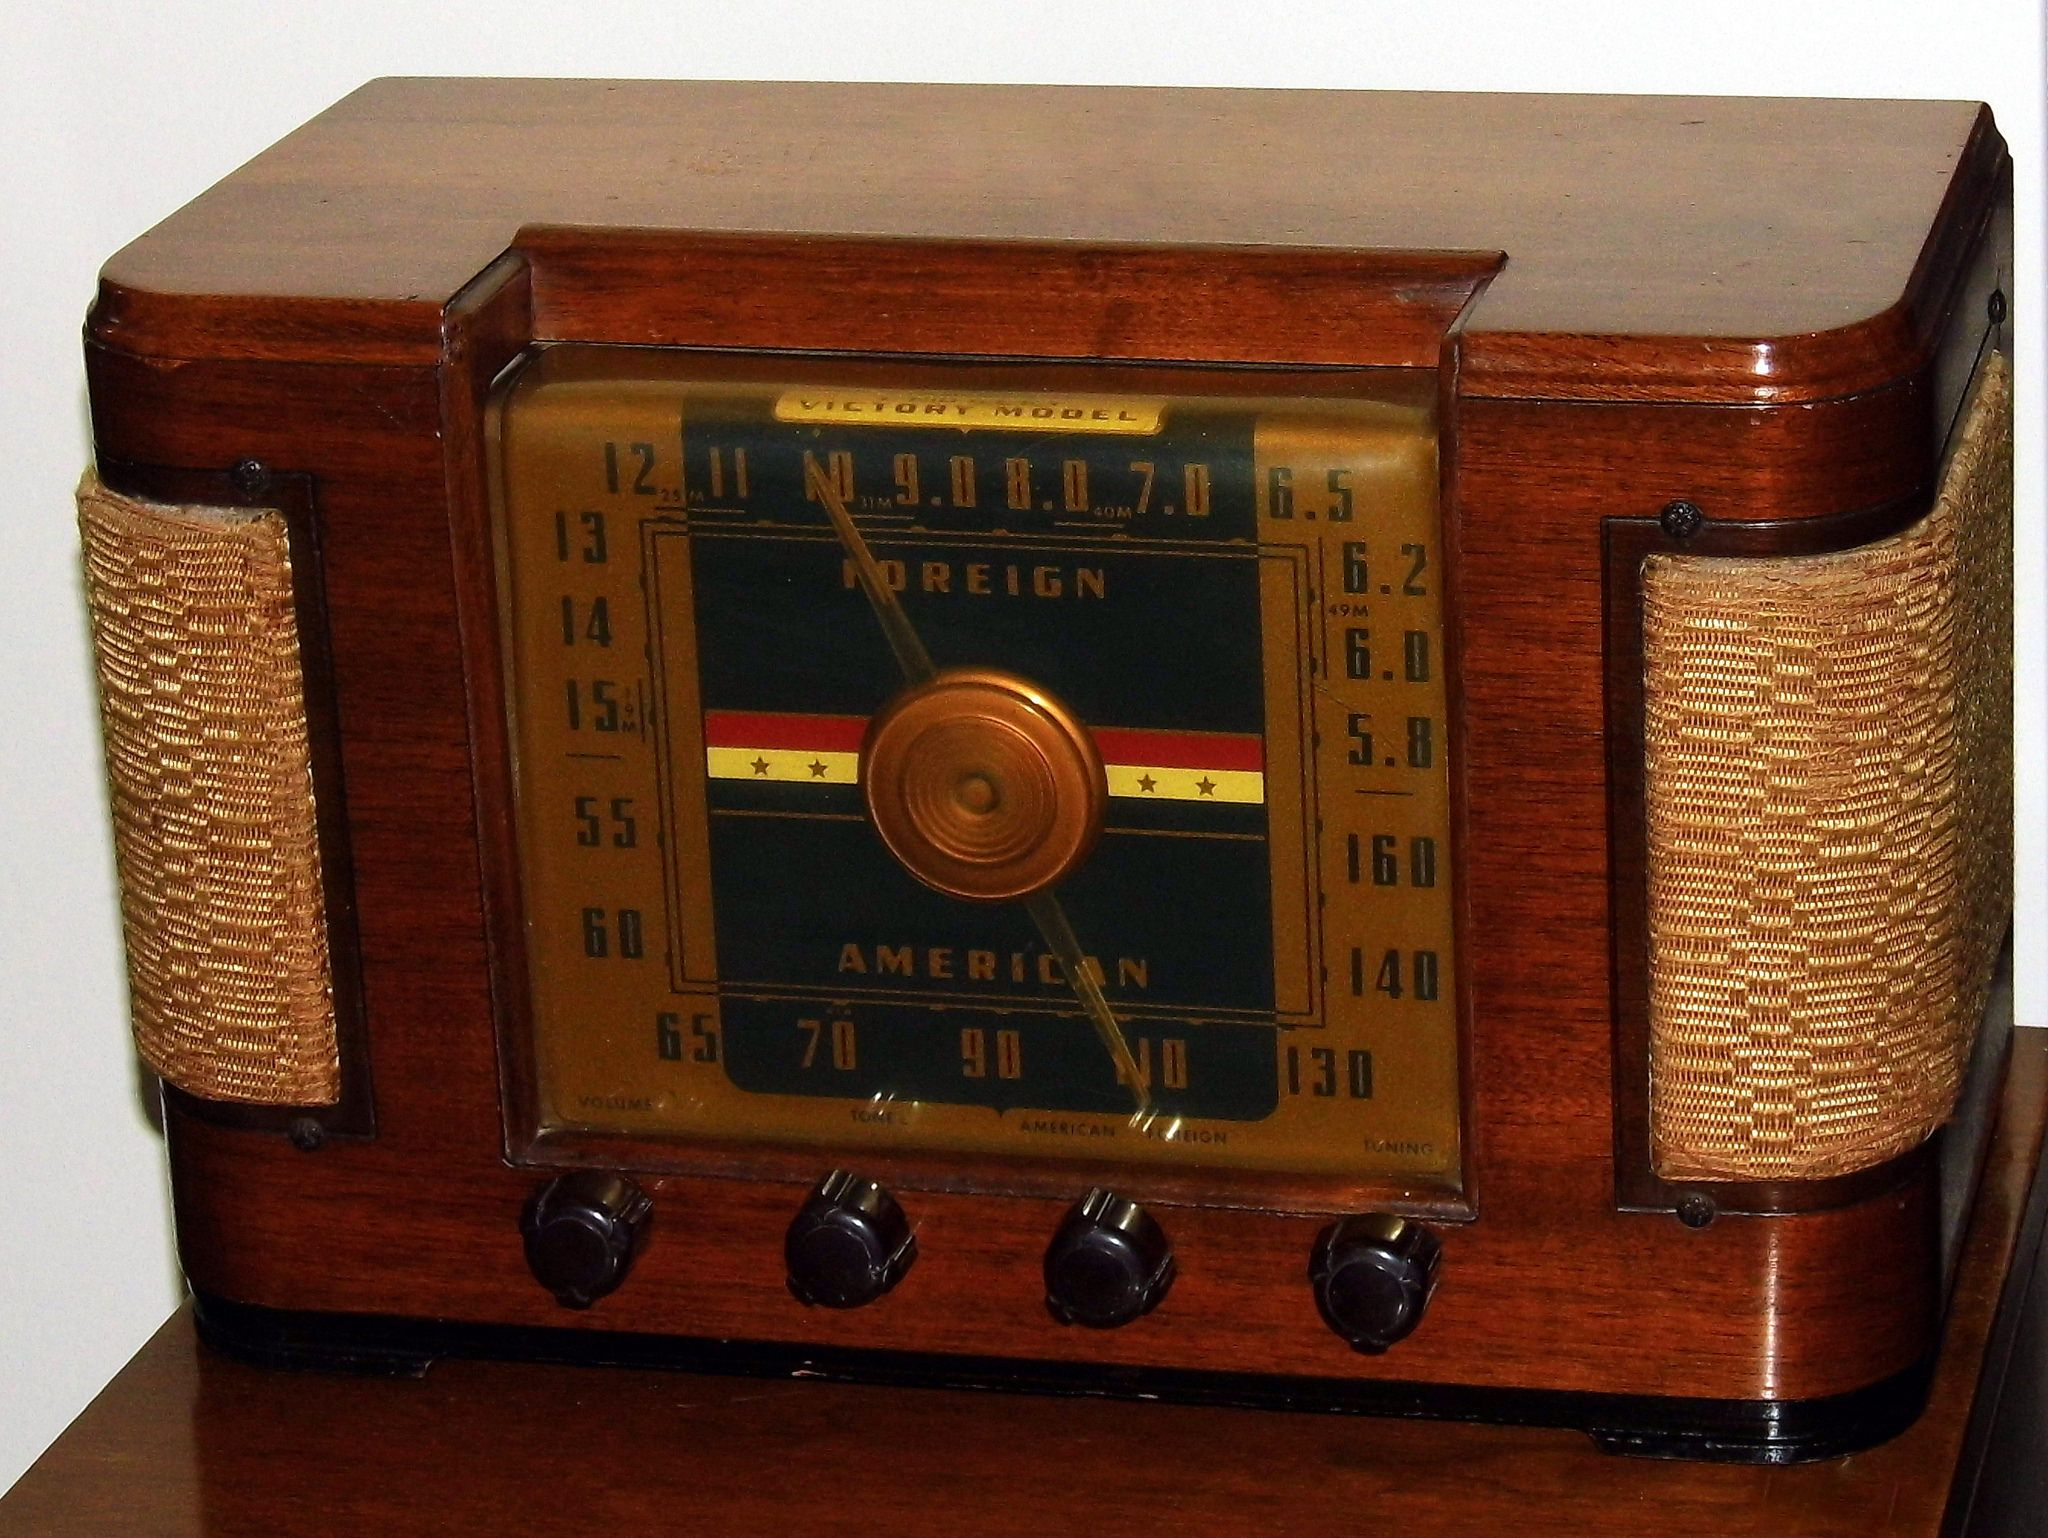 Vintage Crosley Victory Model Table Radio Model 63tj Broadcast Short Wave Bands 6 Vacuum Tubes Wood Cabinet Made In Usa Circa 1946 Antique Radio Vintage Radio Retro Radios